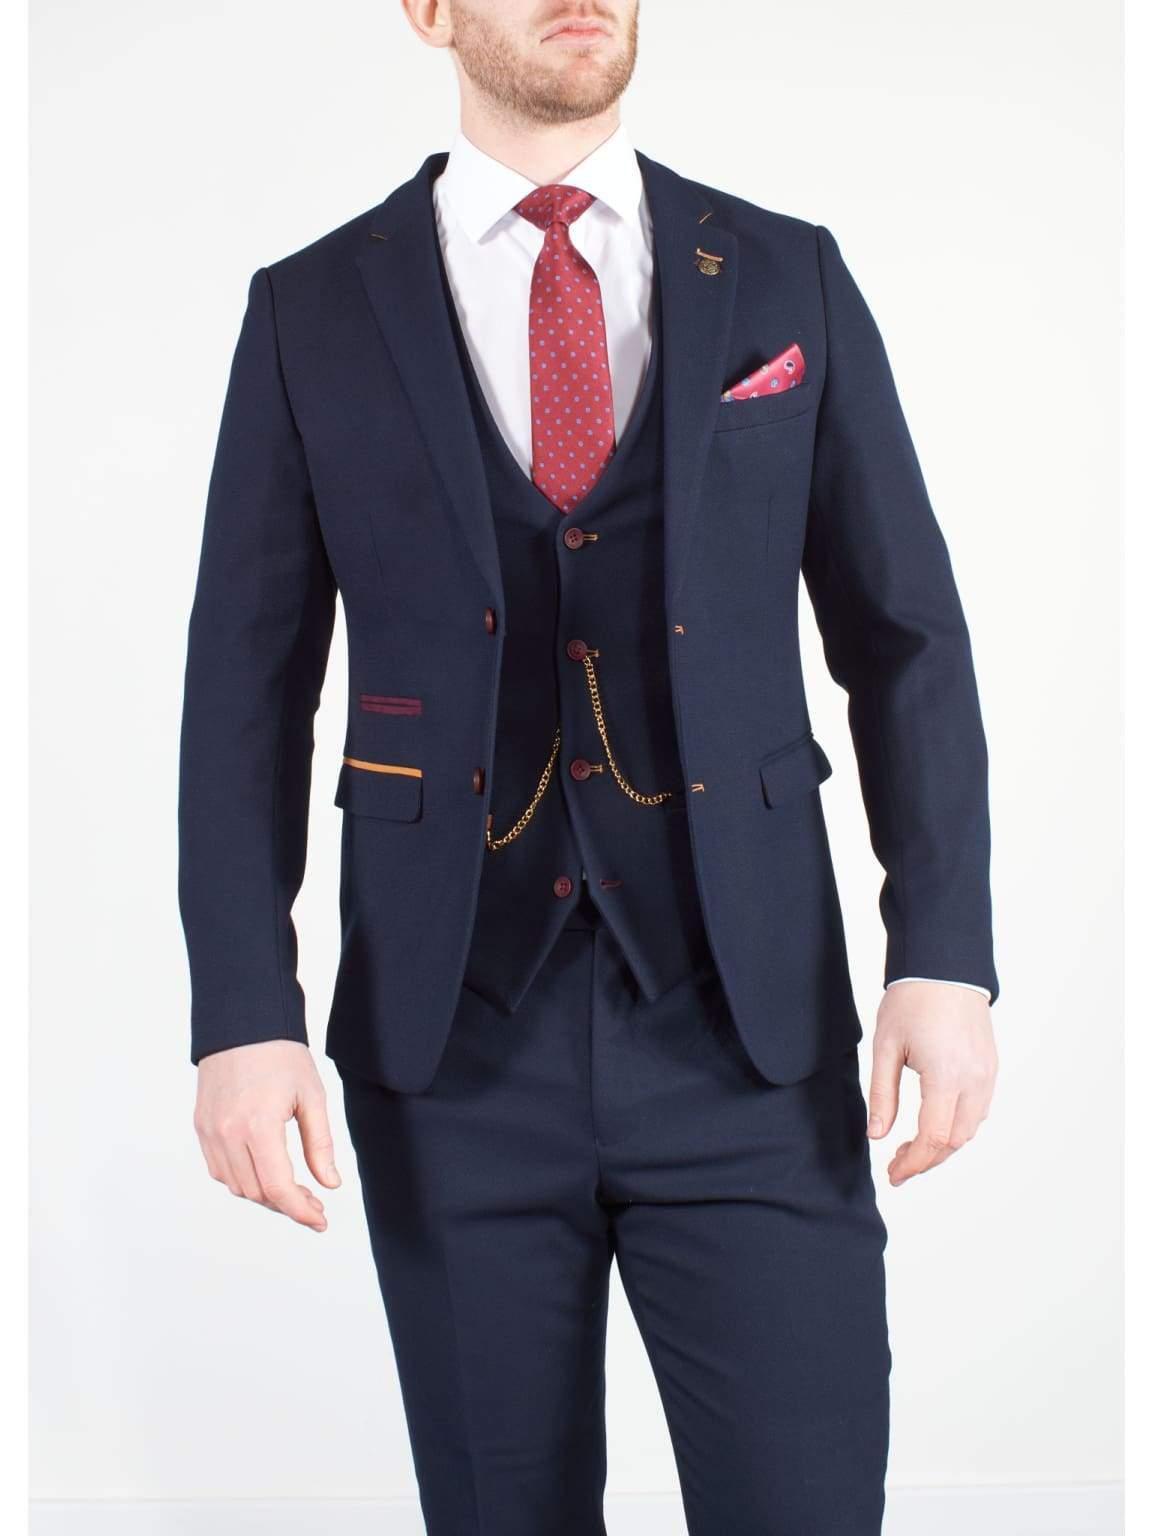 Marc Darcy JD4 Mens 3 Piece Navy Slim Fit Birds Eye Suit - Suit & Tailoring